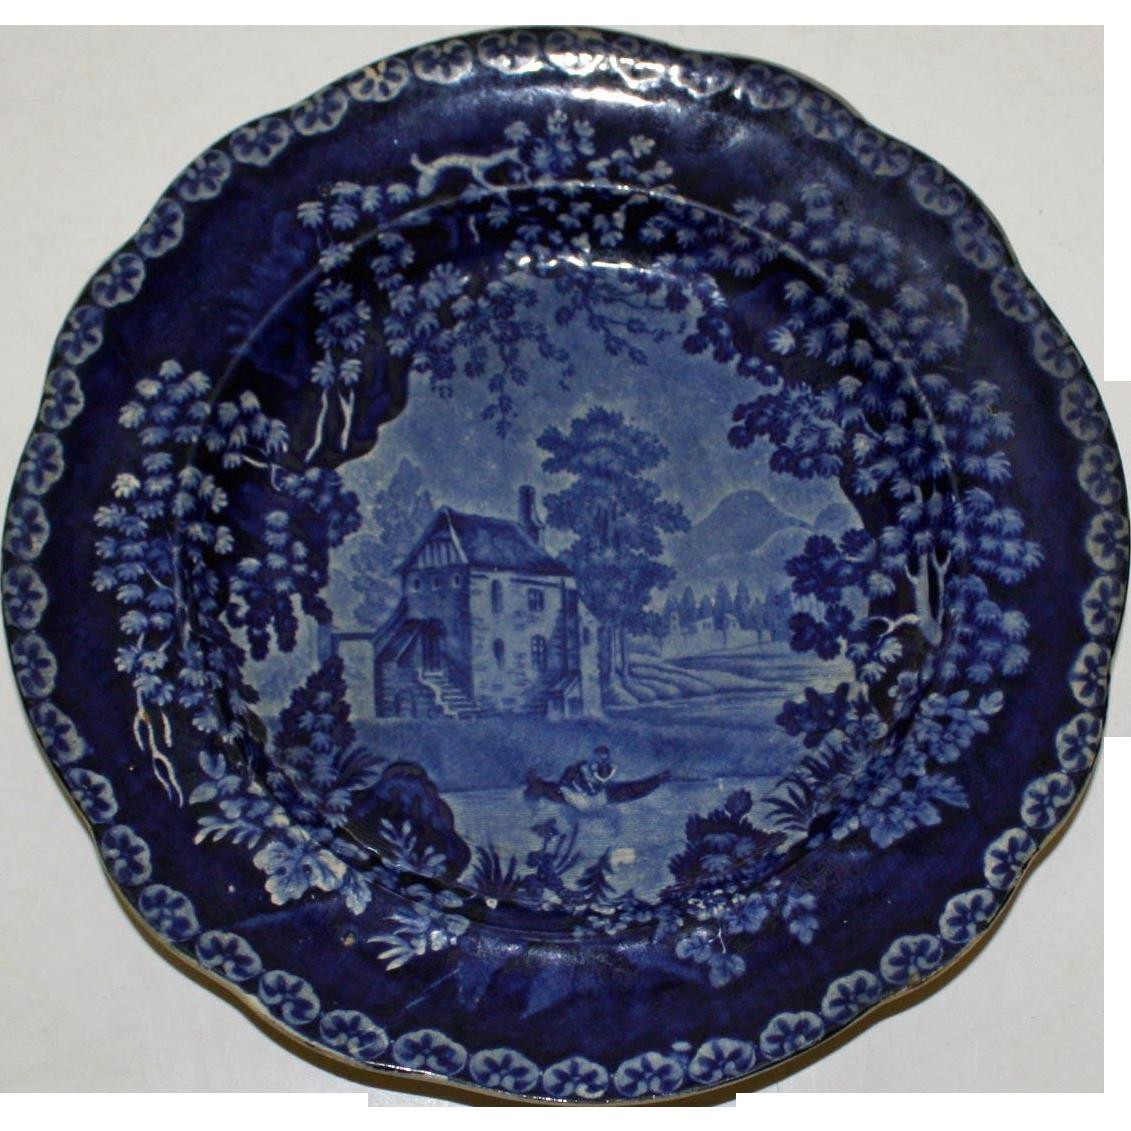 Adams c. 1830 Historical Blue River Scene Transferware Plate